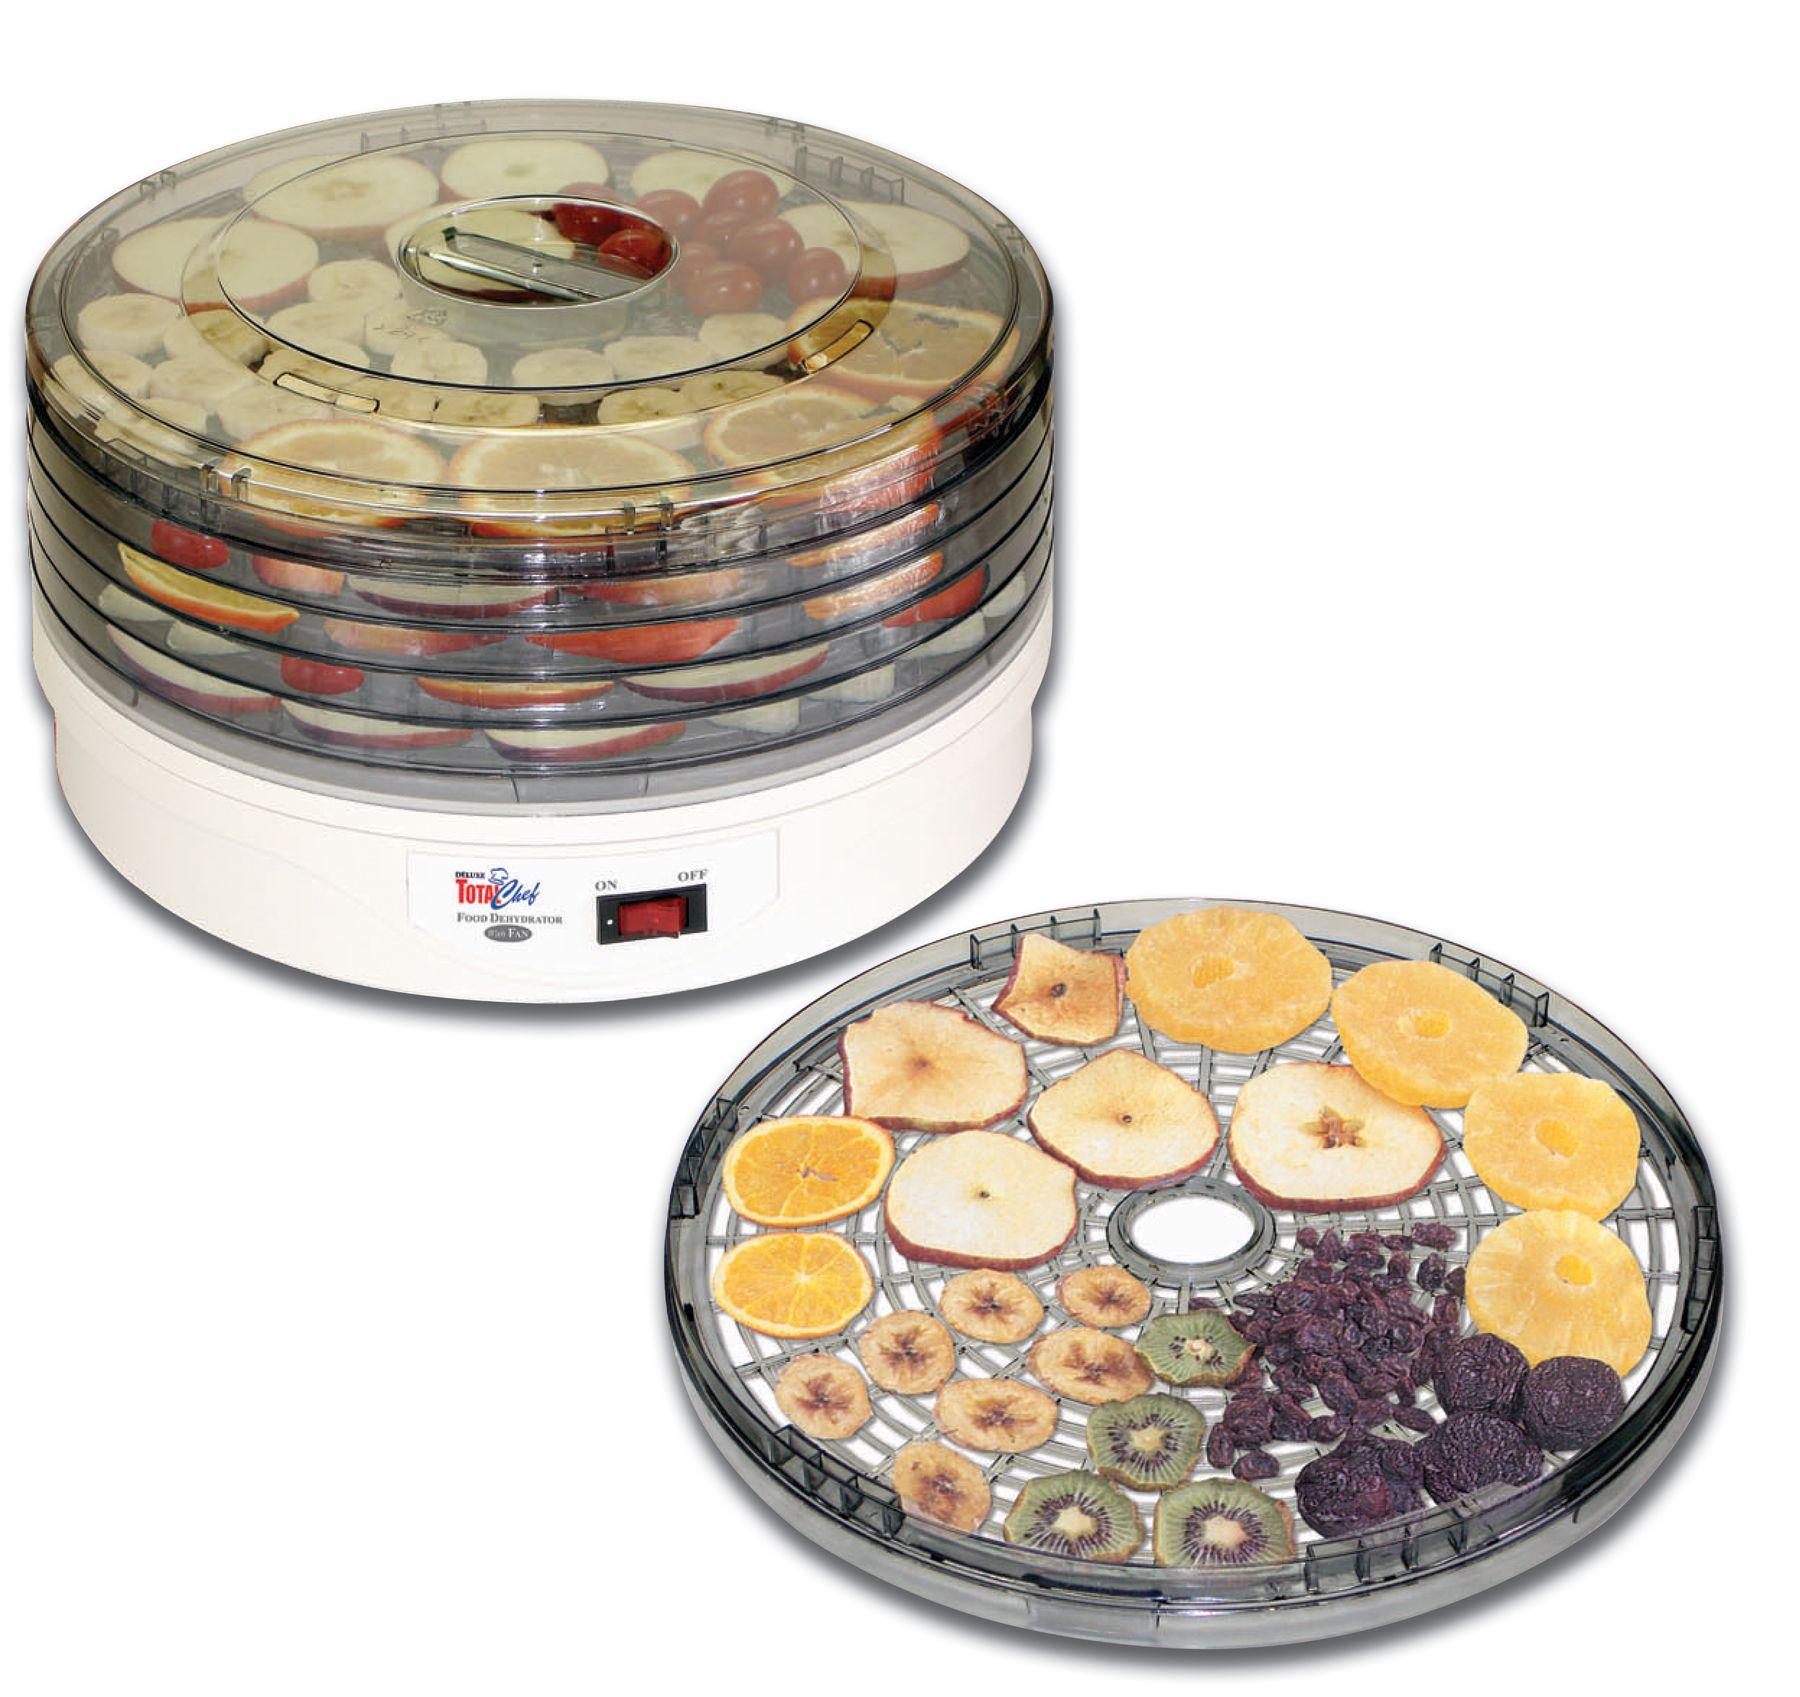 4997 total chef food dehydrator5 tray at walmartca